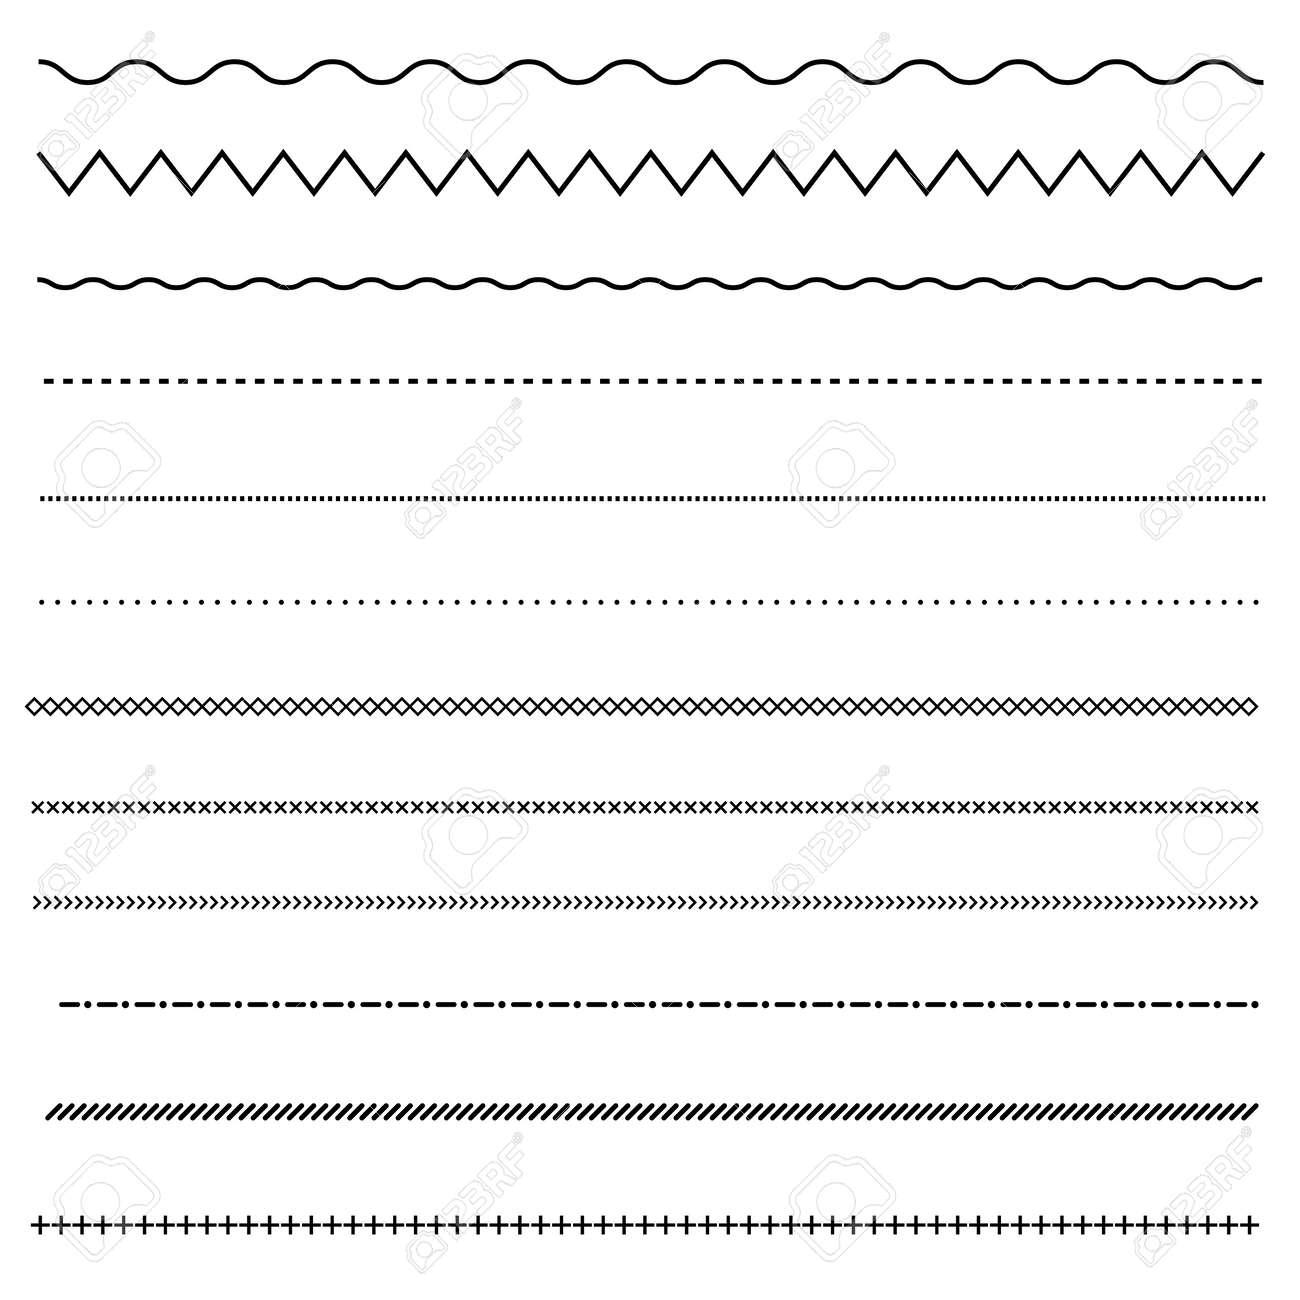 set of line on white background. dot and line patterns. line border symbol. - 154902225